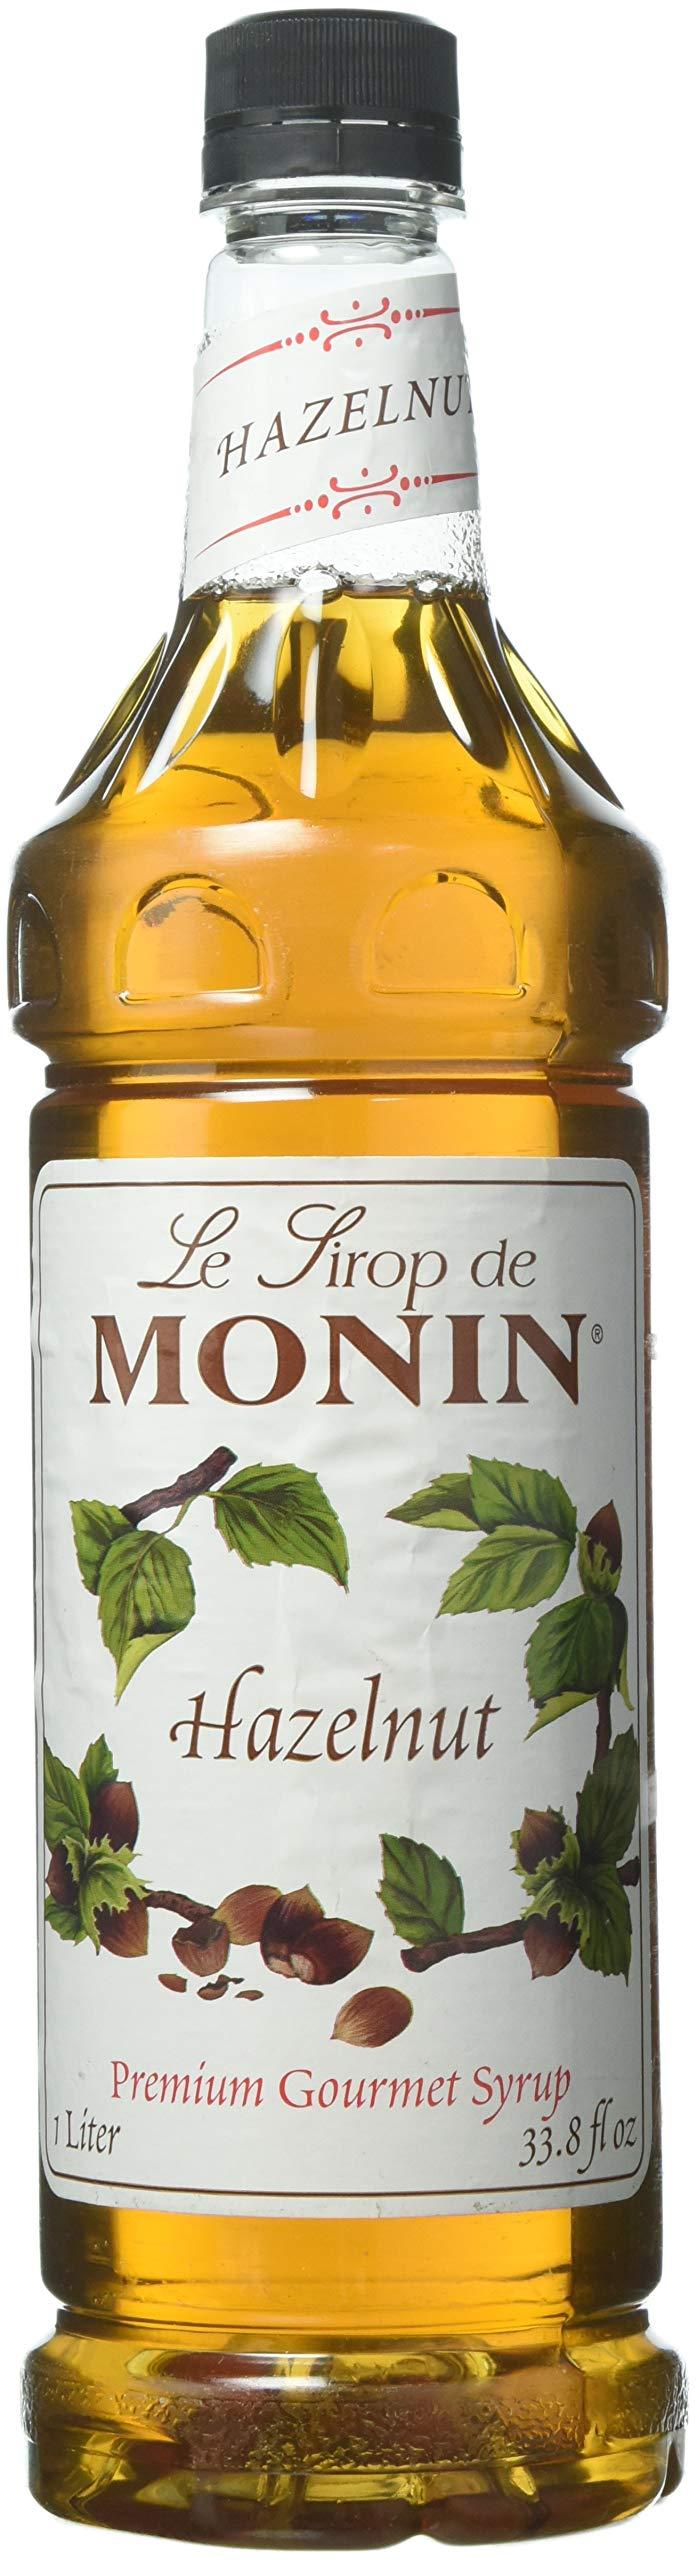 Monin Flavored Syrup, Hazelnut, 33.8-Ounce Plastic Bottle (1 liter)